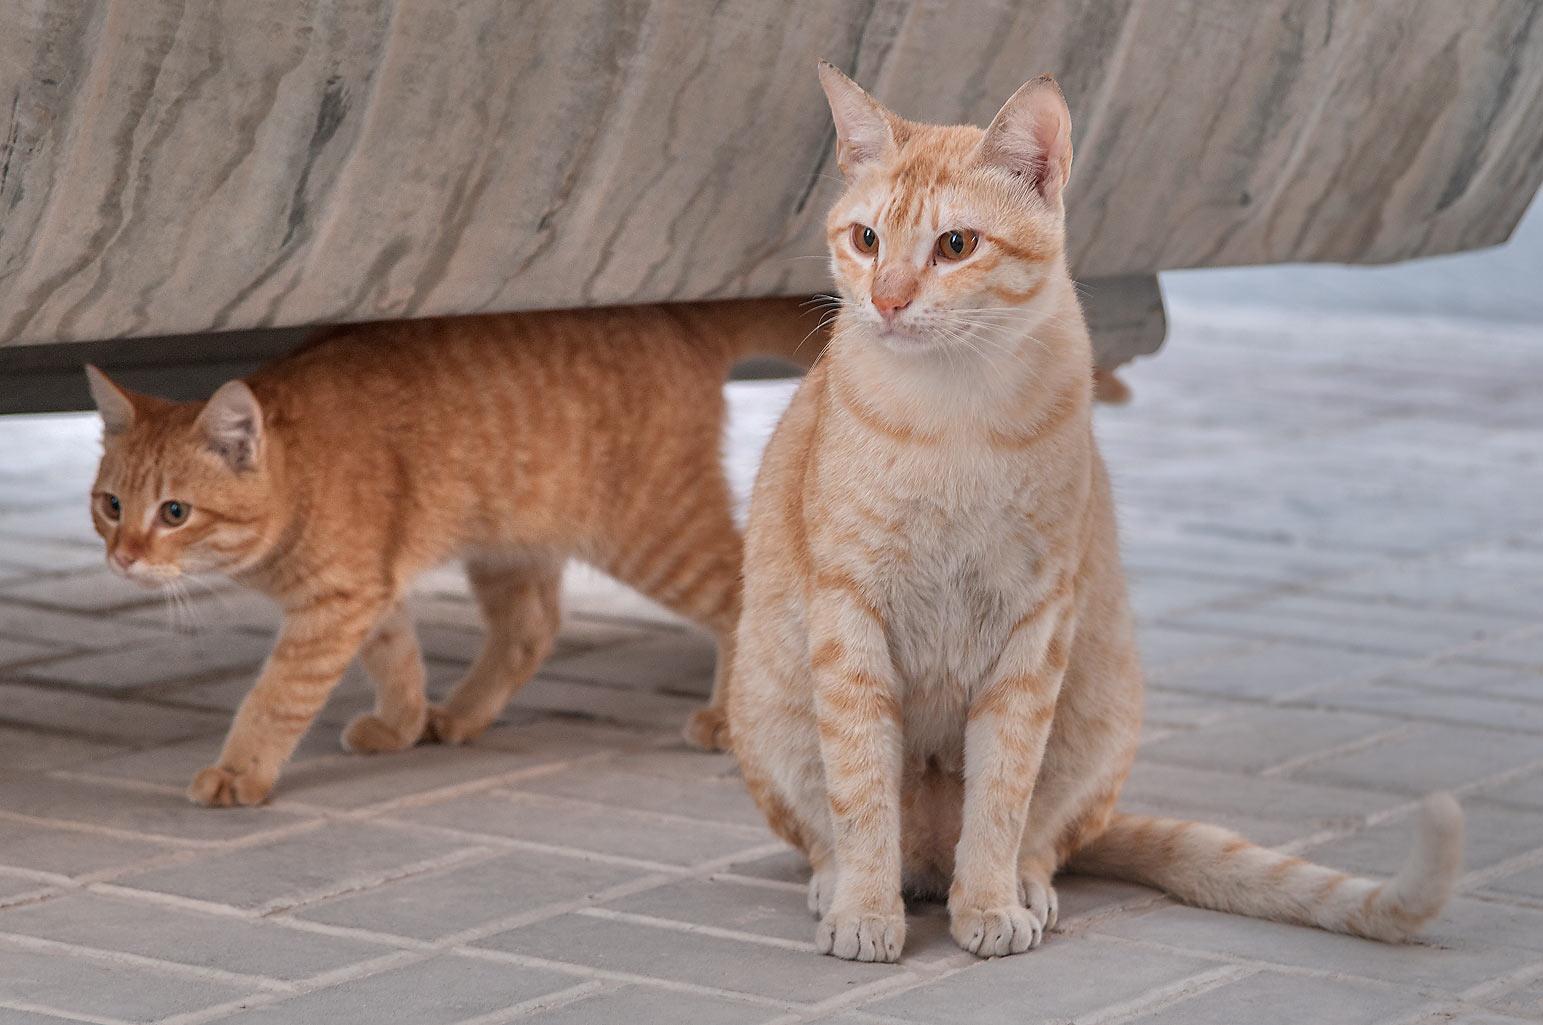 Photo 1169-11: Brown arabian mau cats under a dumpster in ...